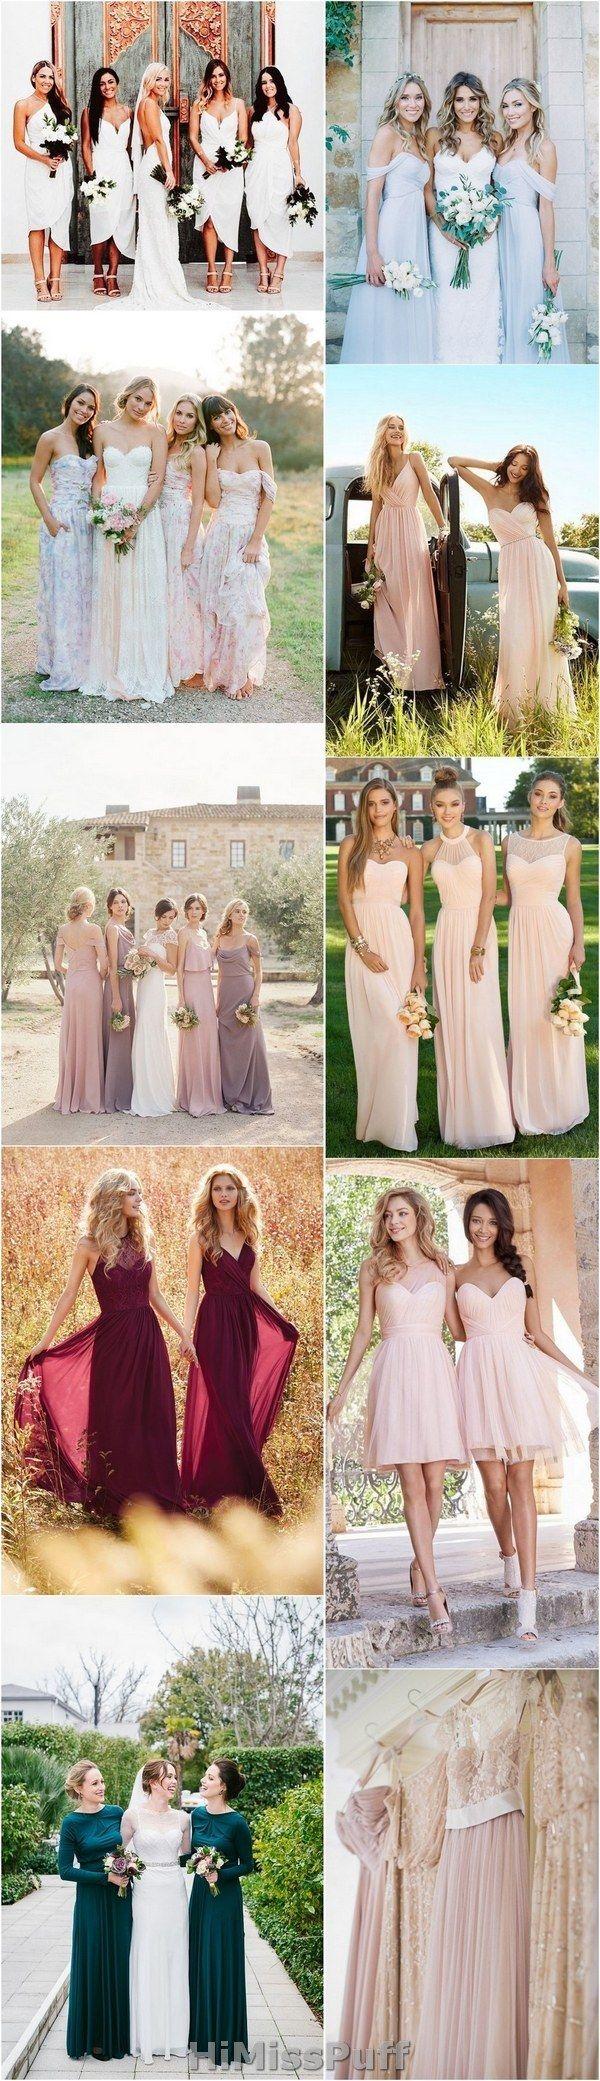 100 Bridesmaid Dresses So Pretty, They'll Actually Wear Them Again / http://www.himisspuff.com/bridesmaid-dress-ideas/